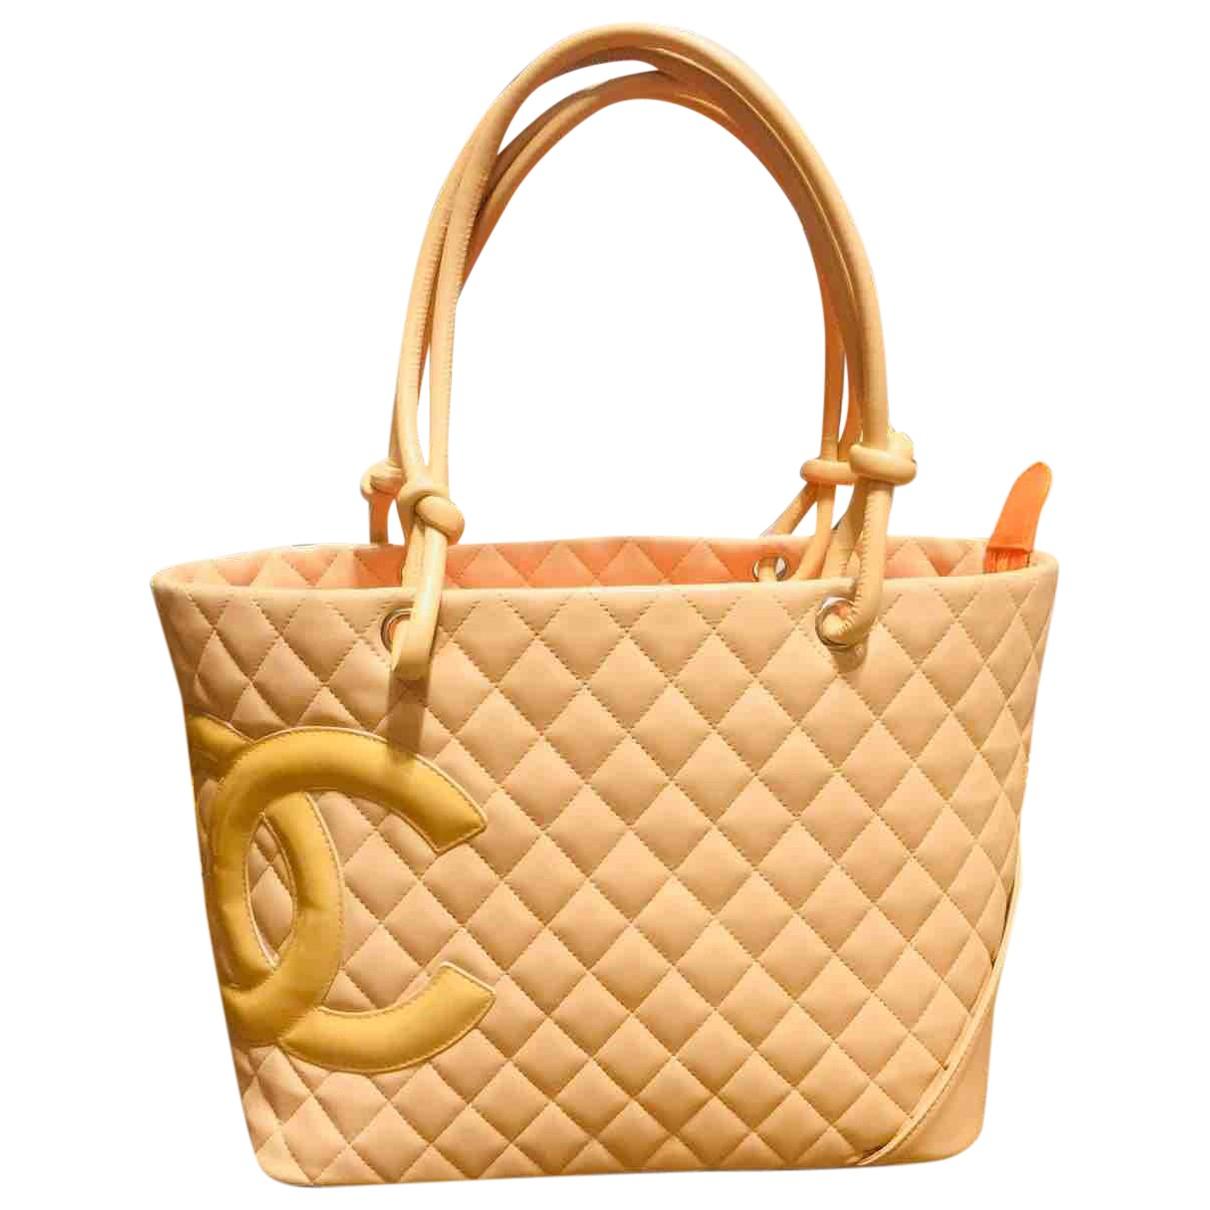 Chanel - Sac a main Cambon pour femme en cuir - beige